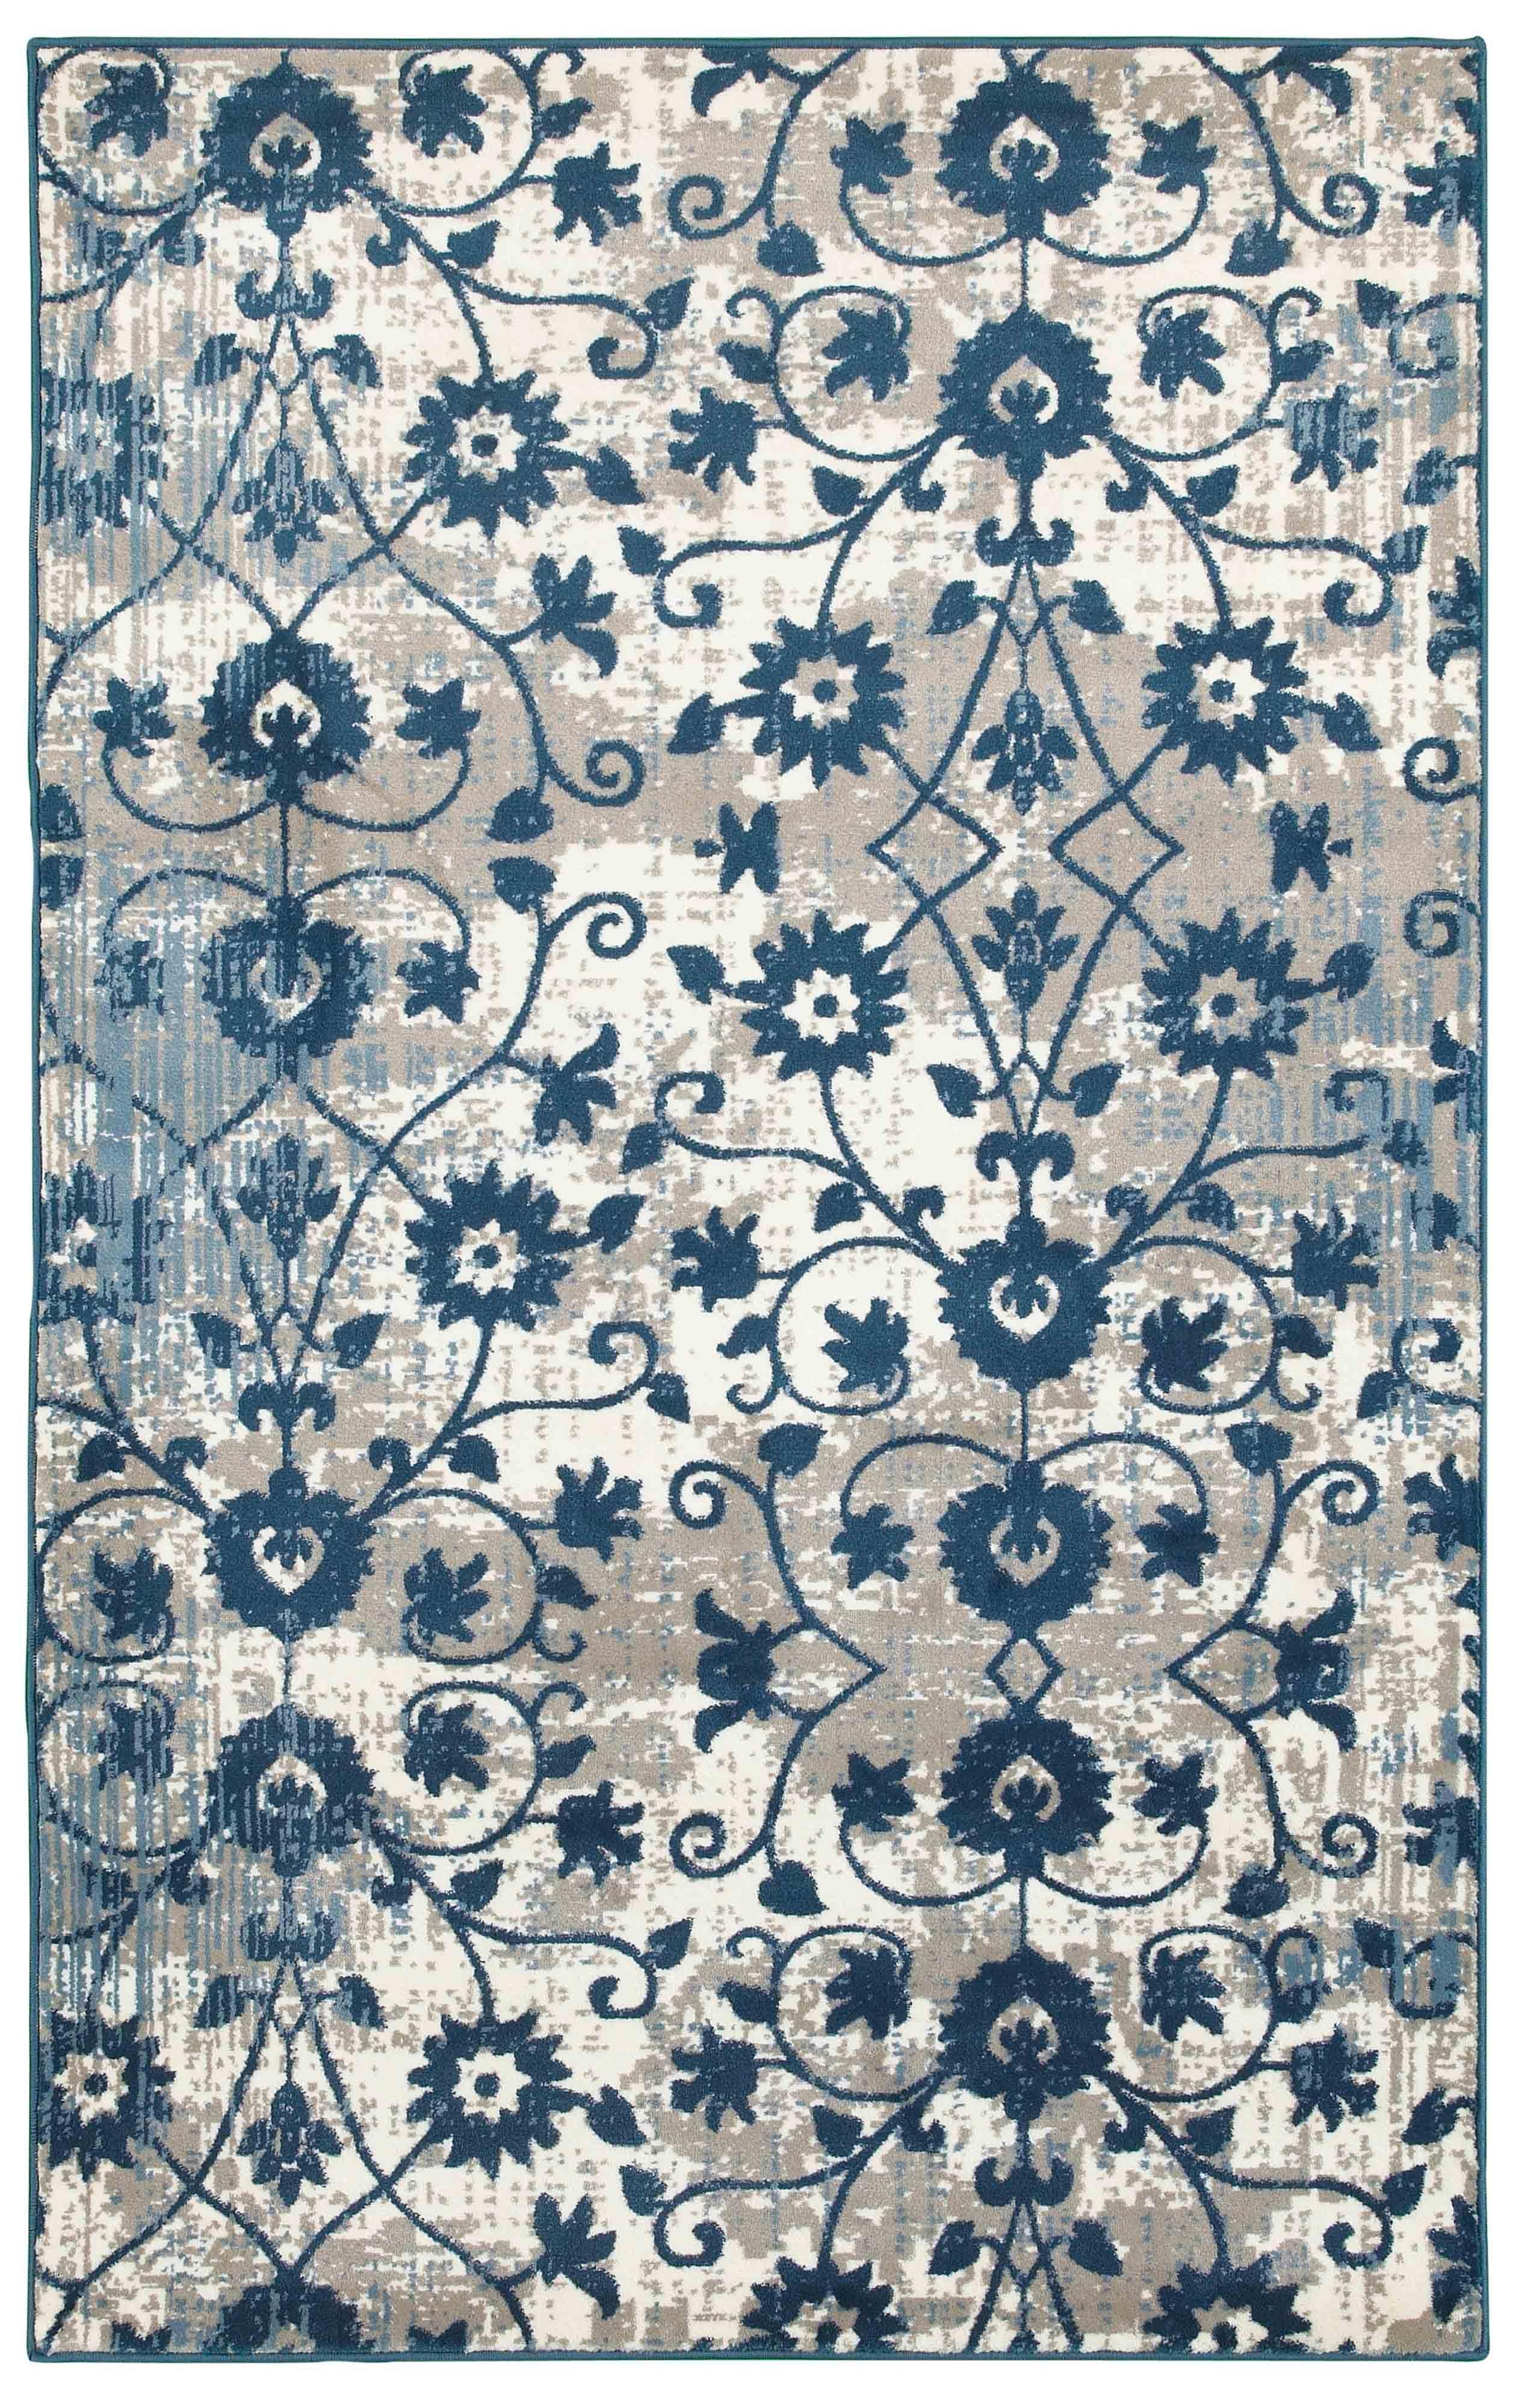 Adana Lr80387 Light Beige Soft Blue Rug Rugs Light Beige